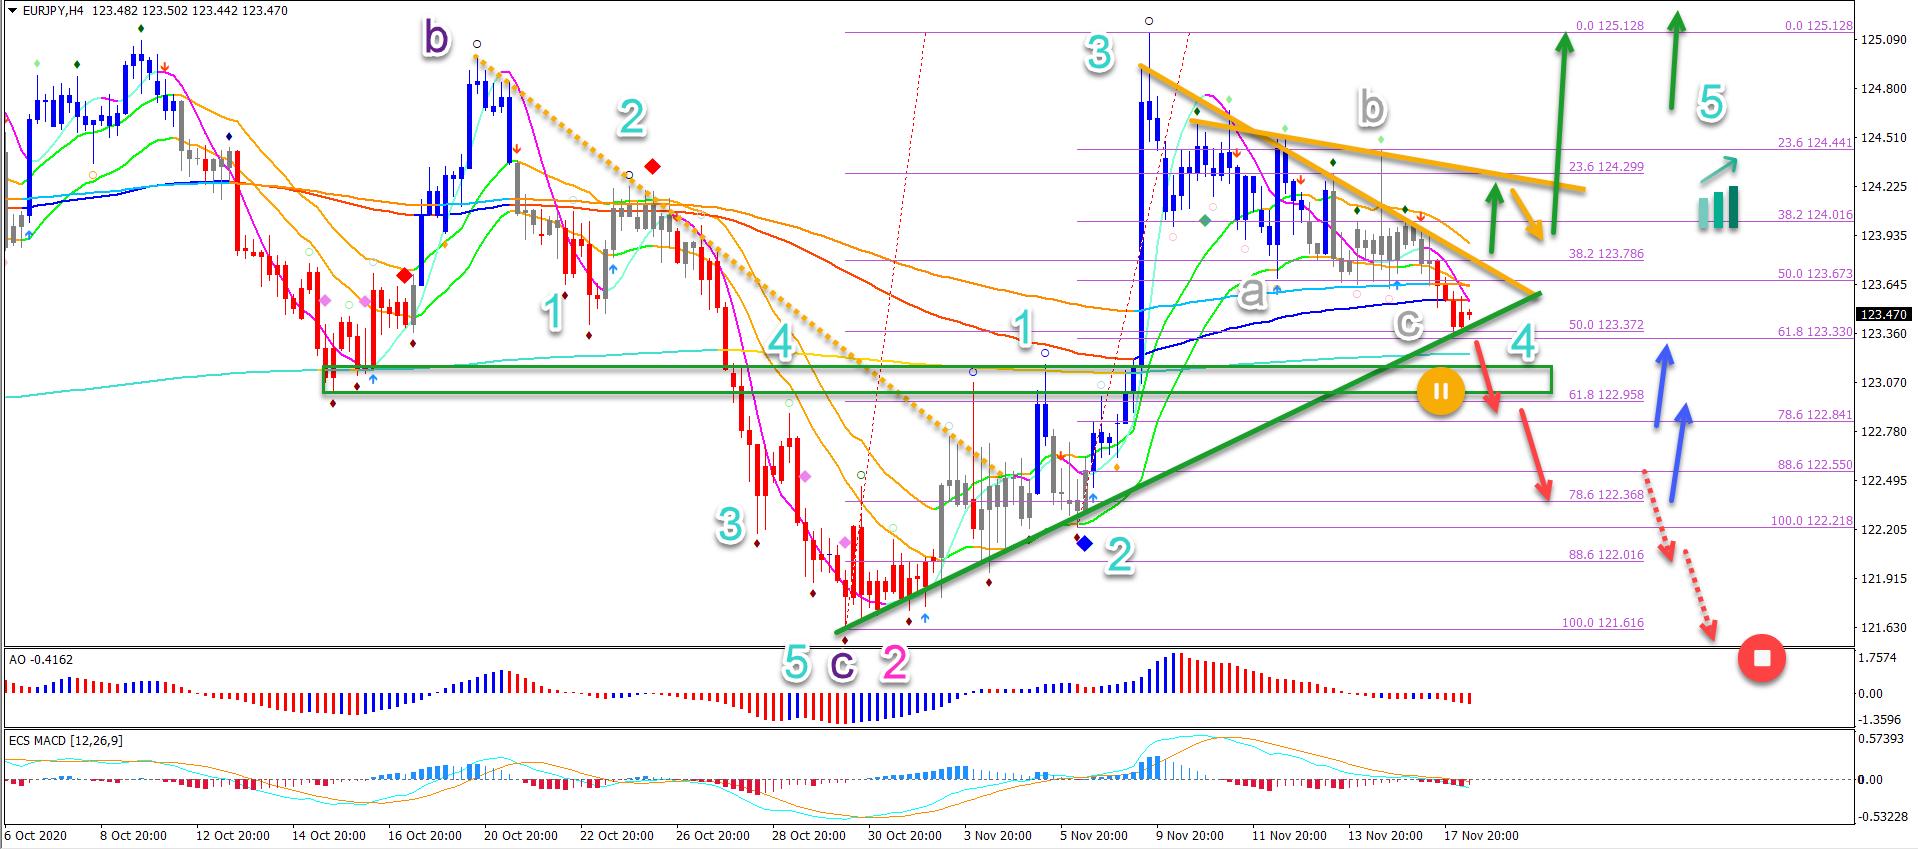 EUR/JPY 4 hour chart